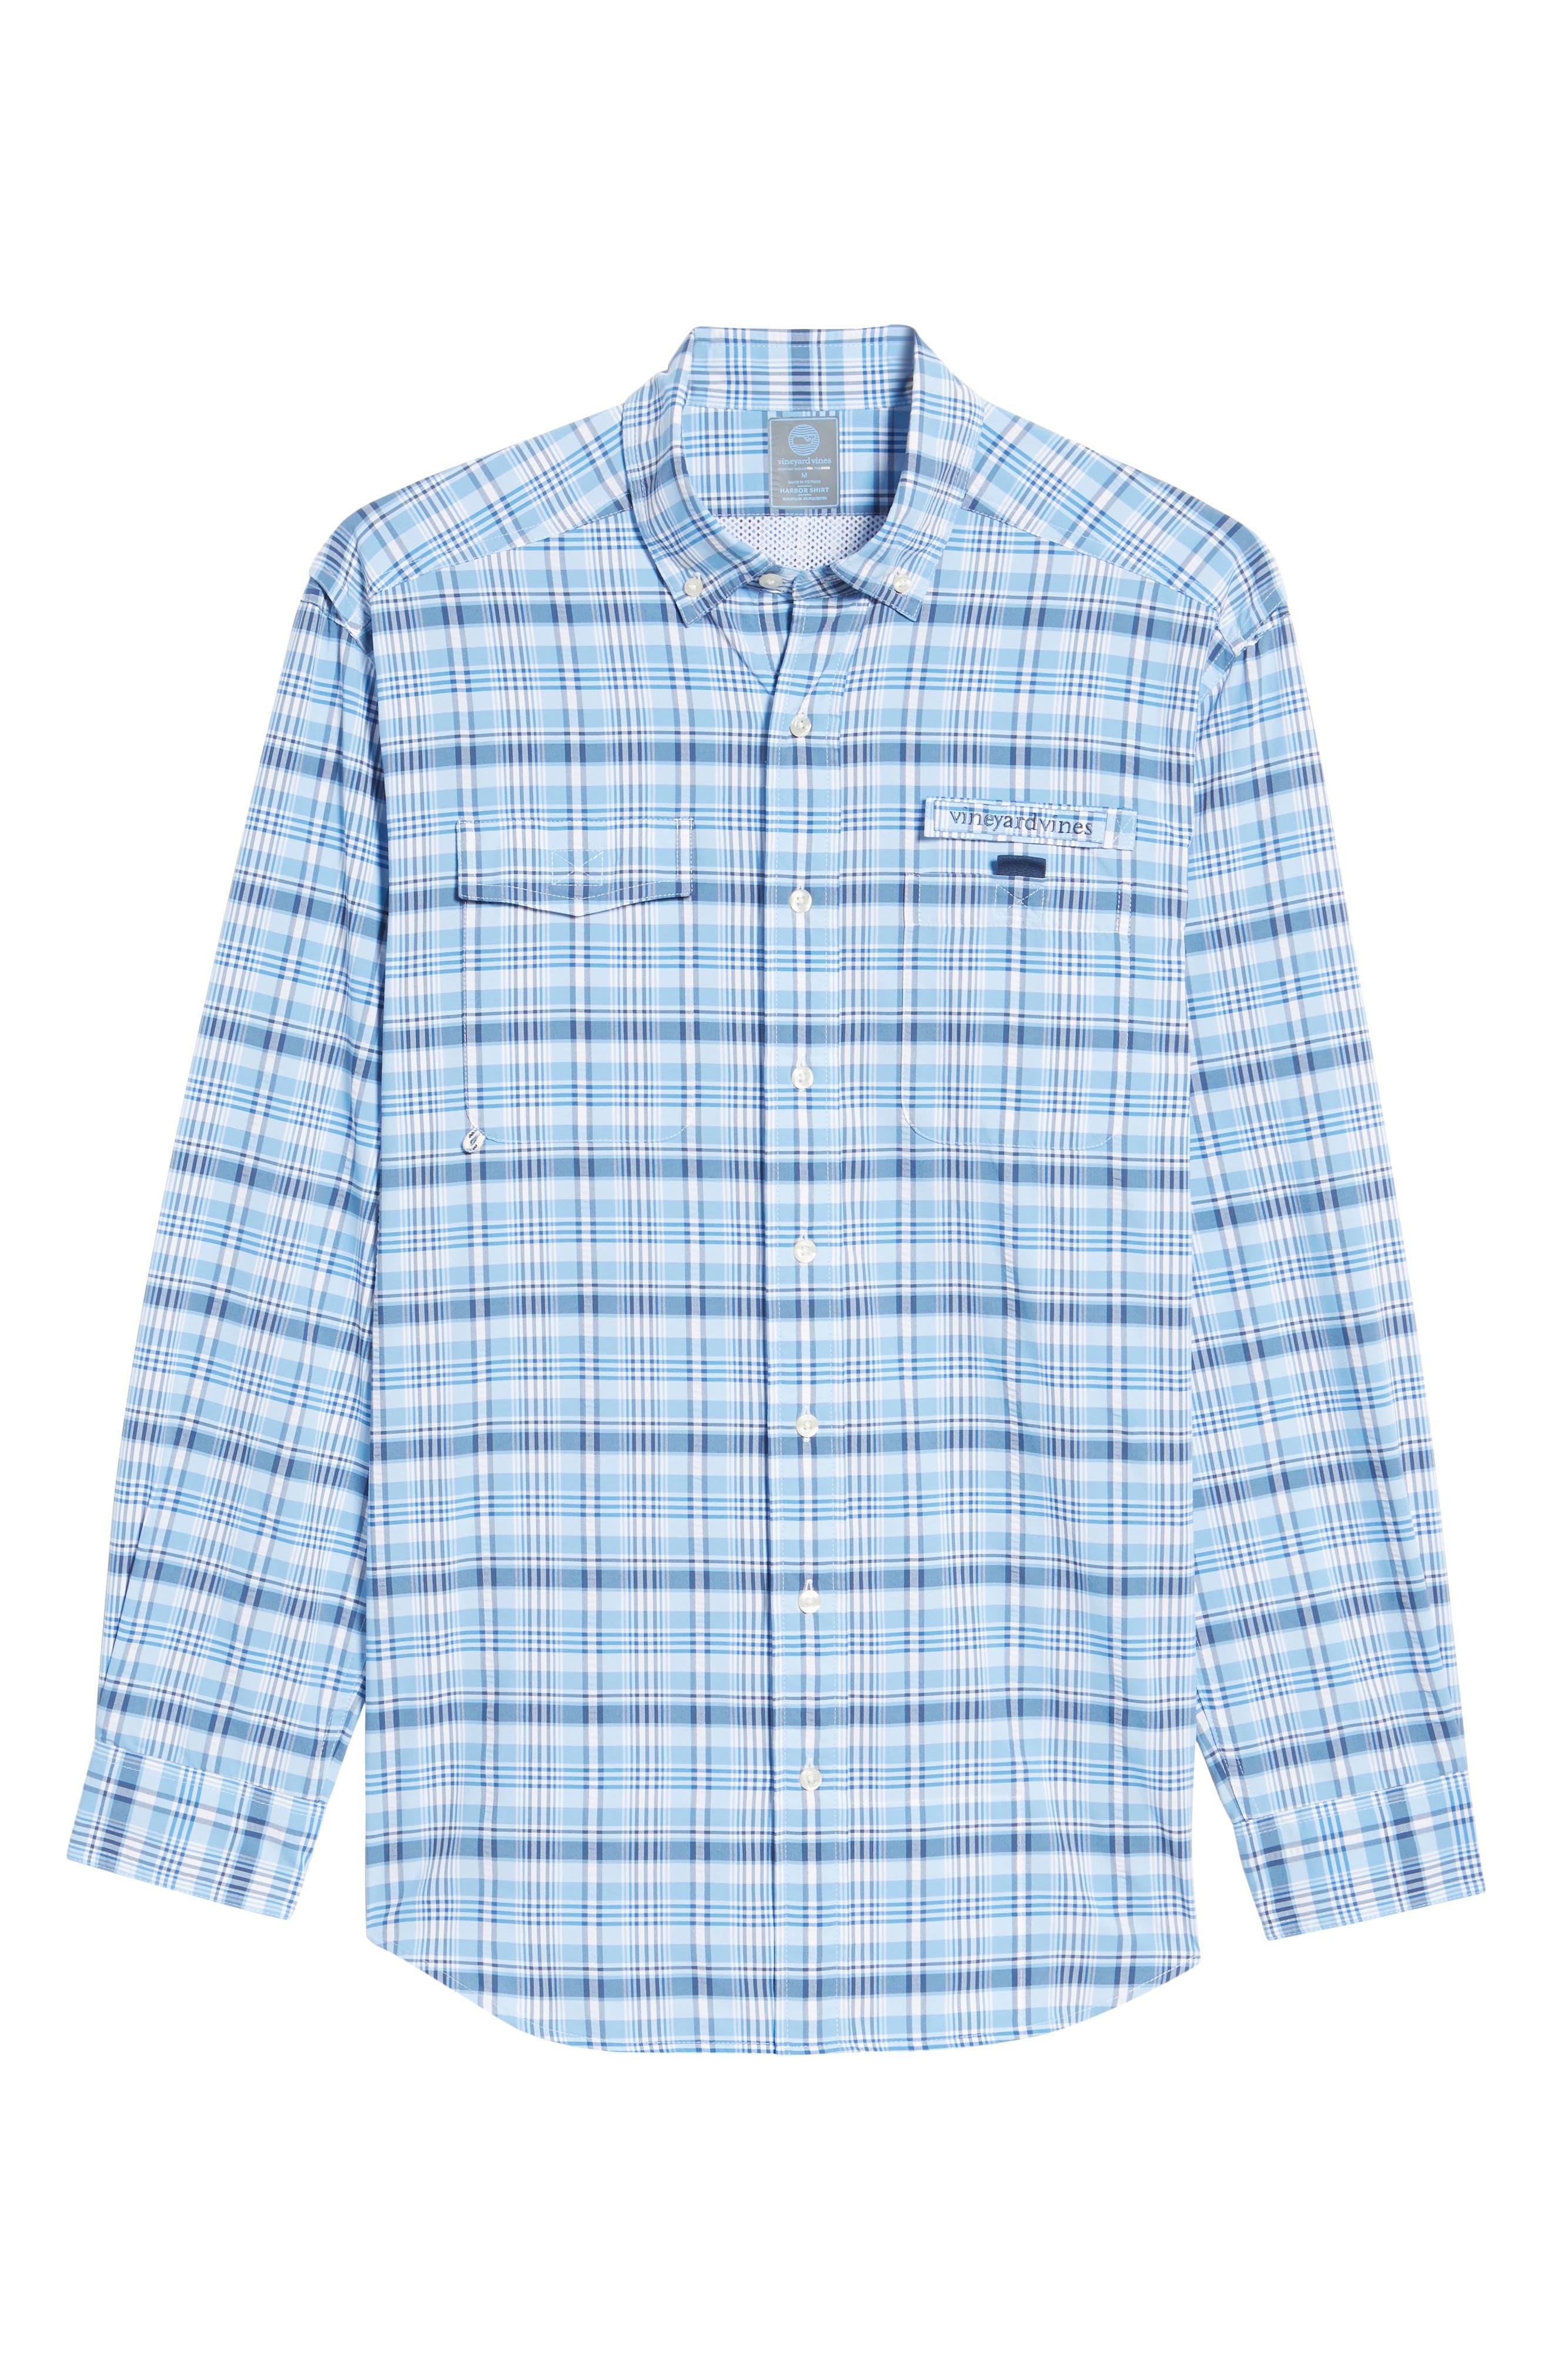 Prospect Hill Harbor Regular Fit Plaid Performance Sport Shirt,                             Alternate thumbnail 6, color,                             484